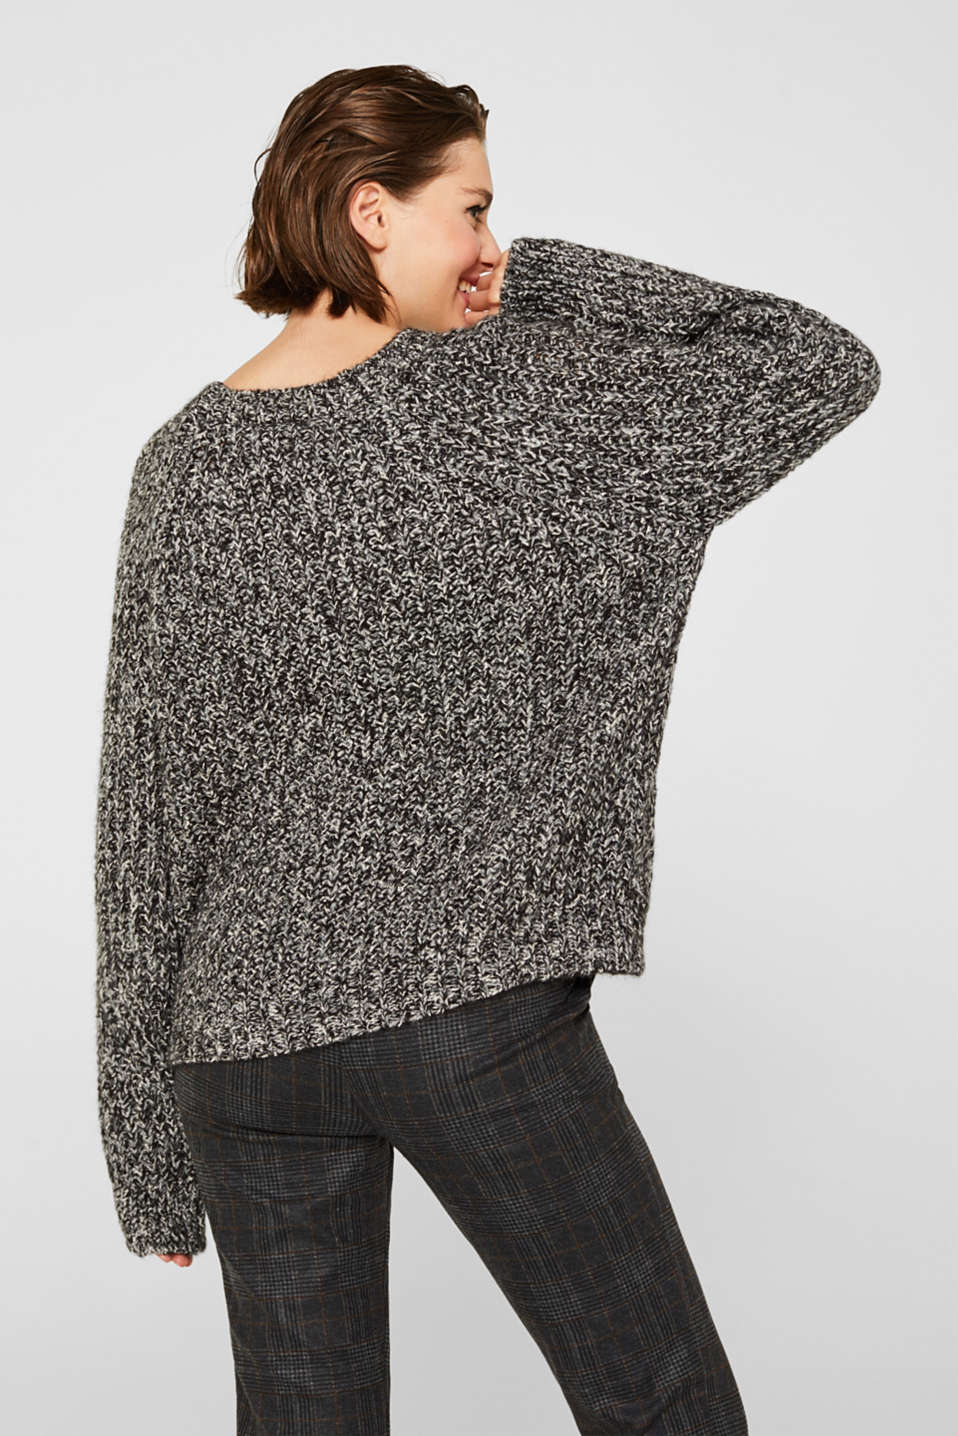 With wool: mouliné jumper, GUNMETAL 4, detail image number 3